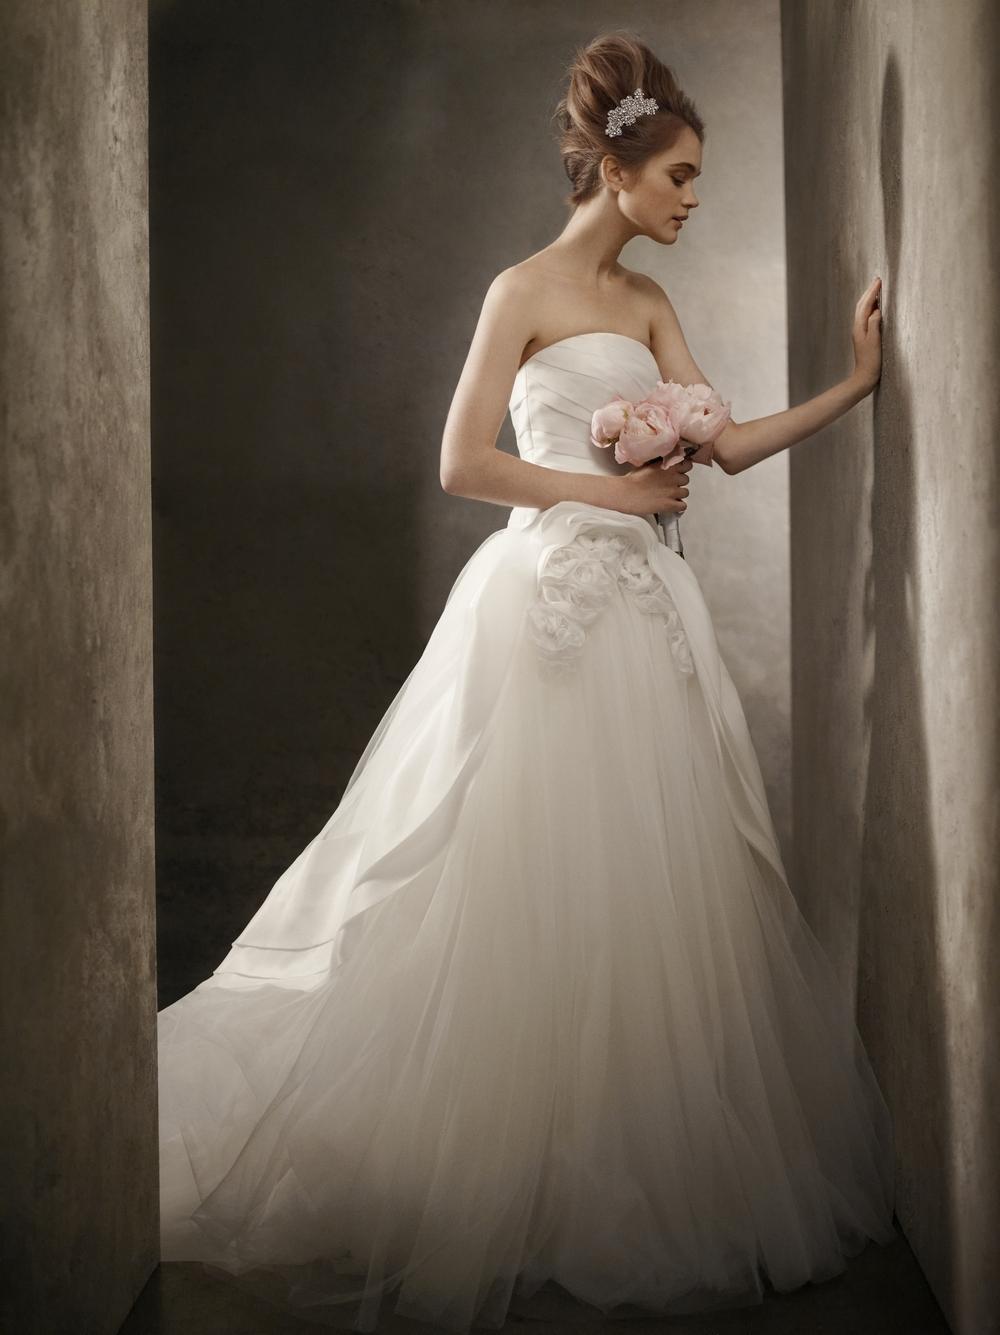 Vw351026 for Vera wang classic wedding dress